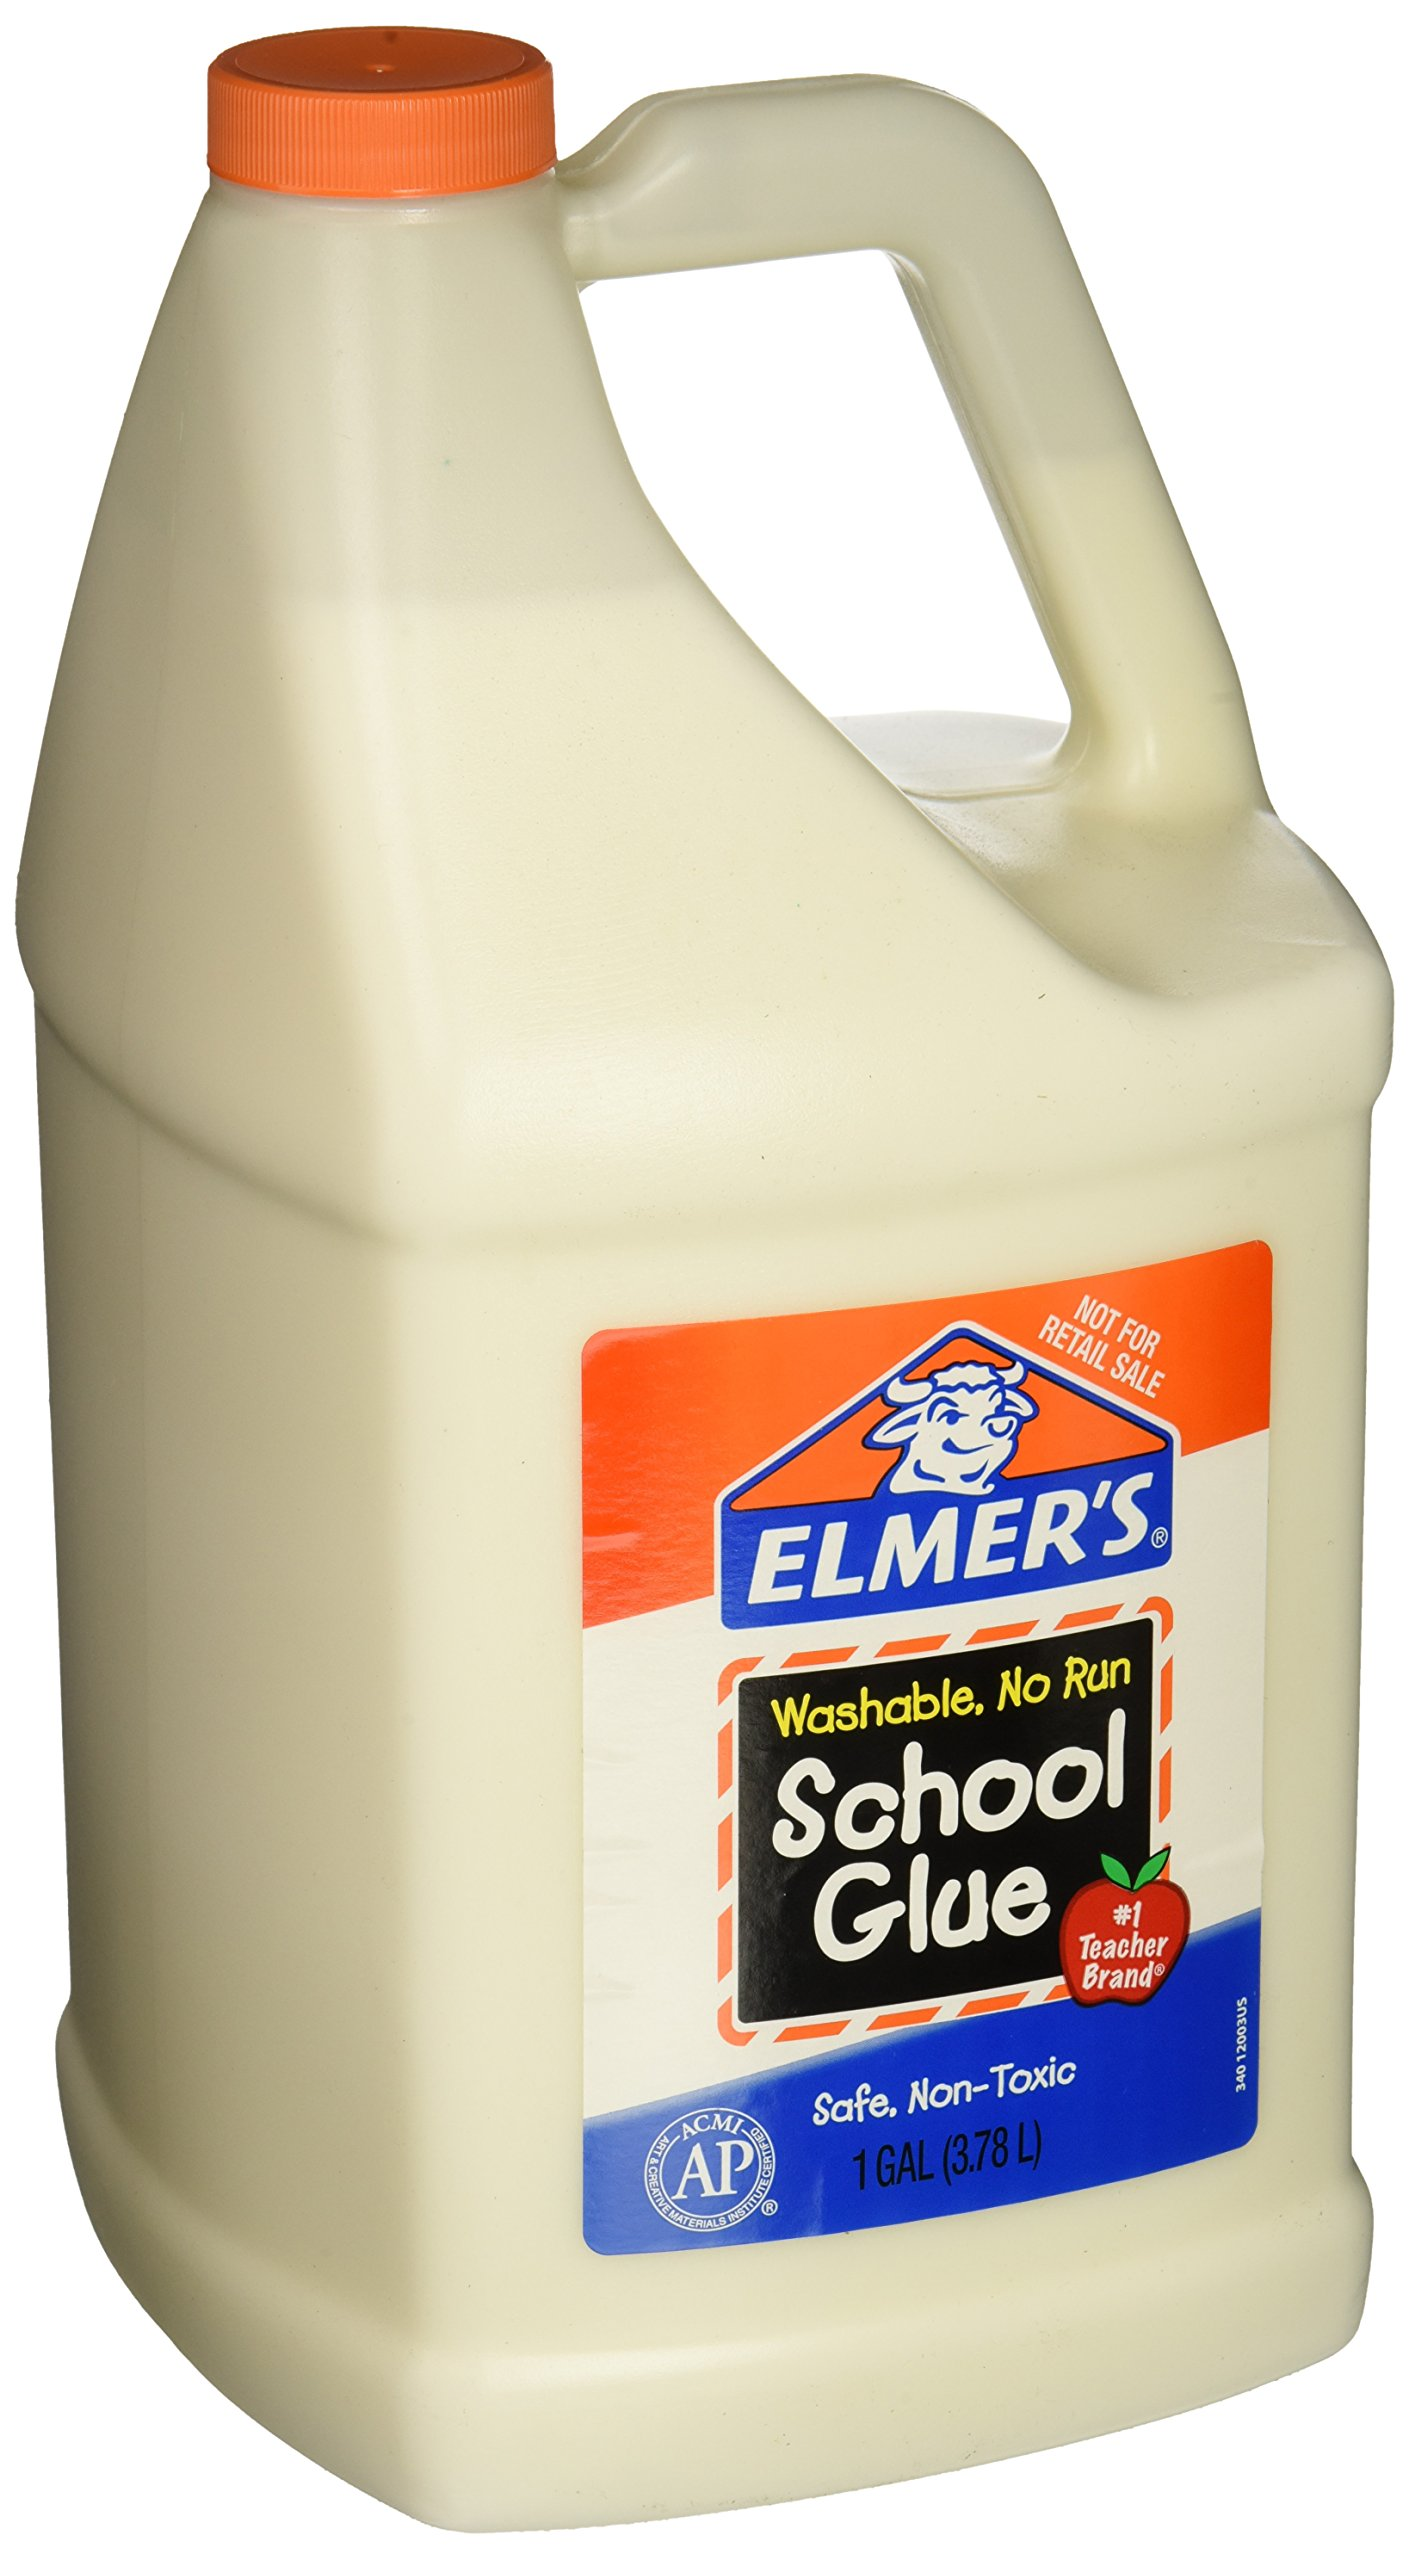 Elmer's E340NRSS School Glue Jar, Washable, 1 gal Capacity, White by Elmer's